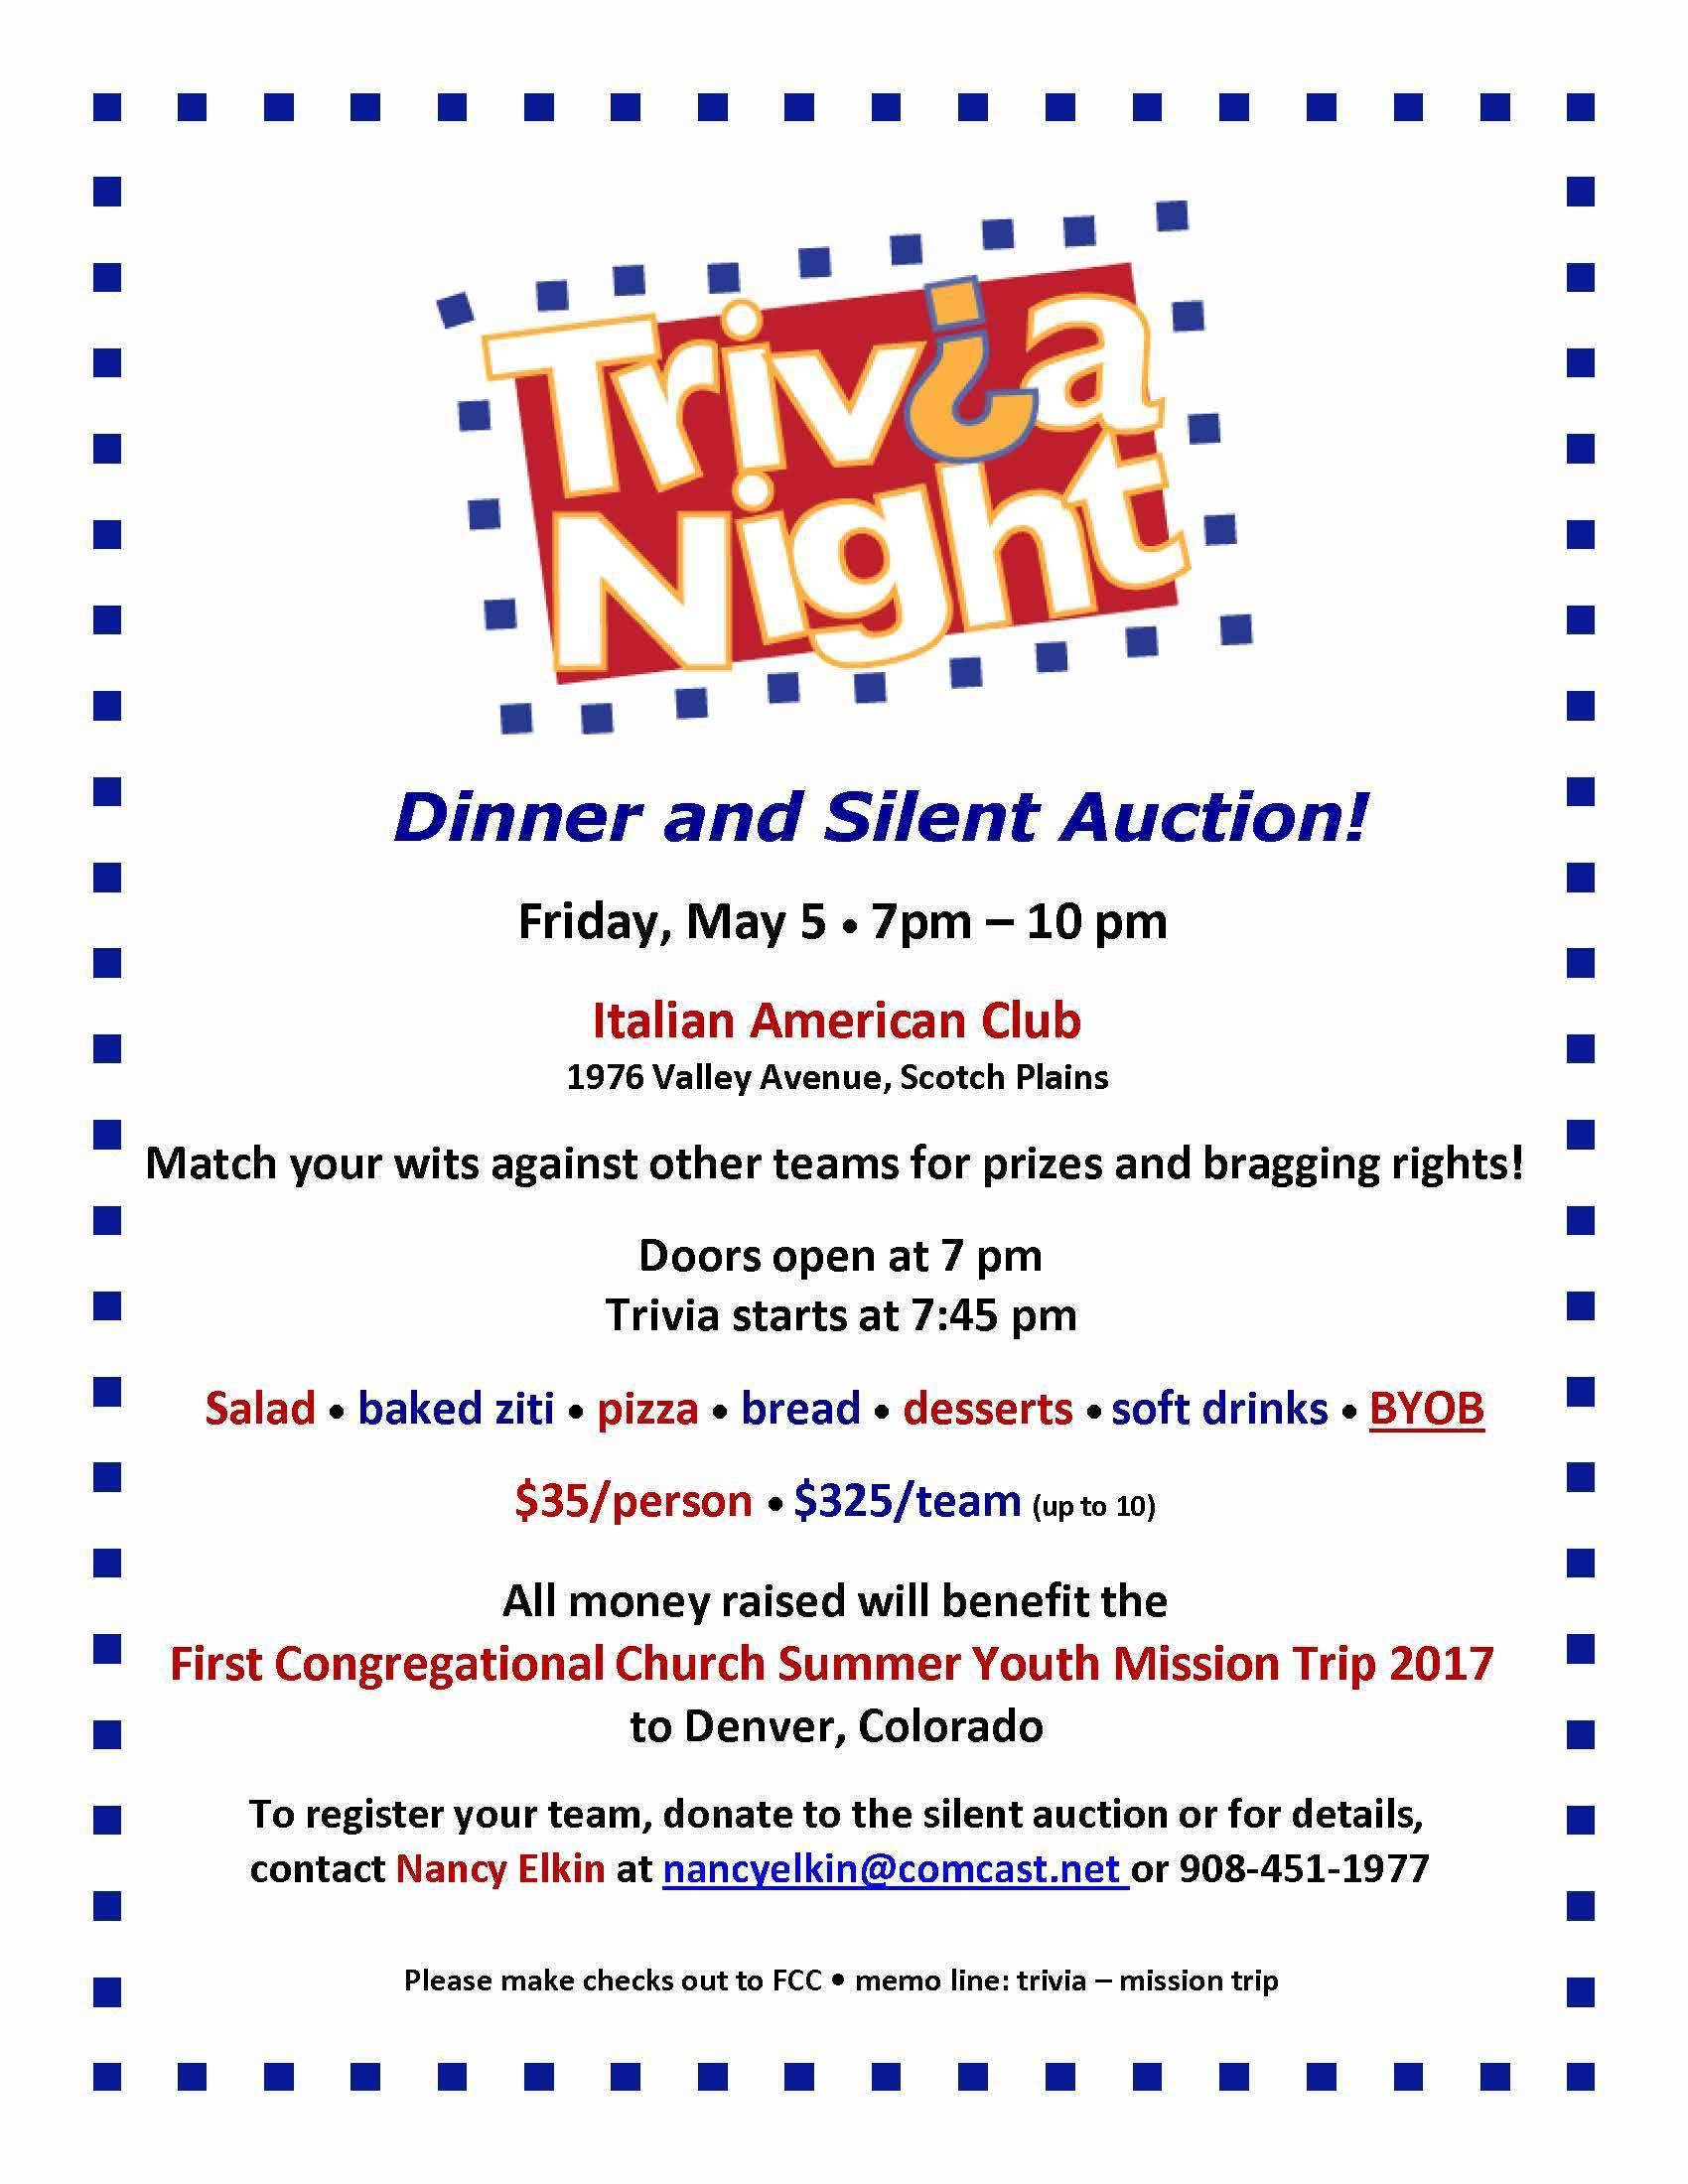 050afade4267c63d8d36_Dinner_and_Silent_Auction_flyer_2.jpg